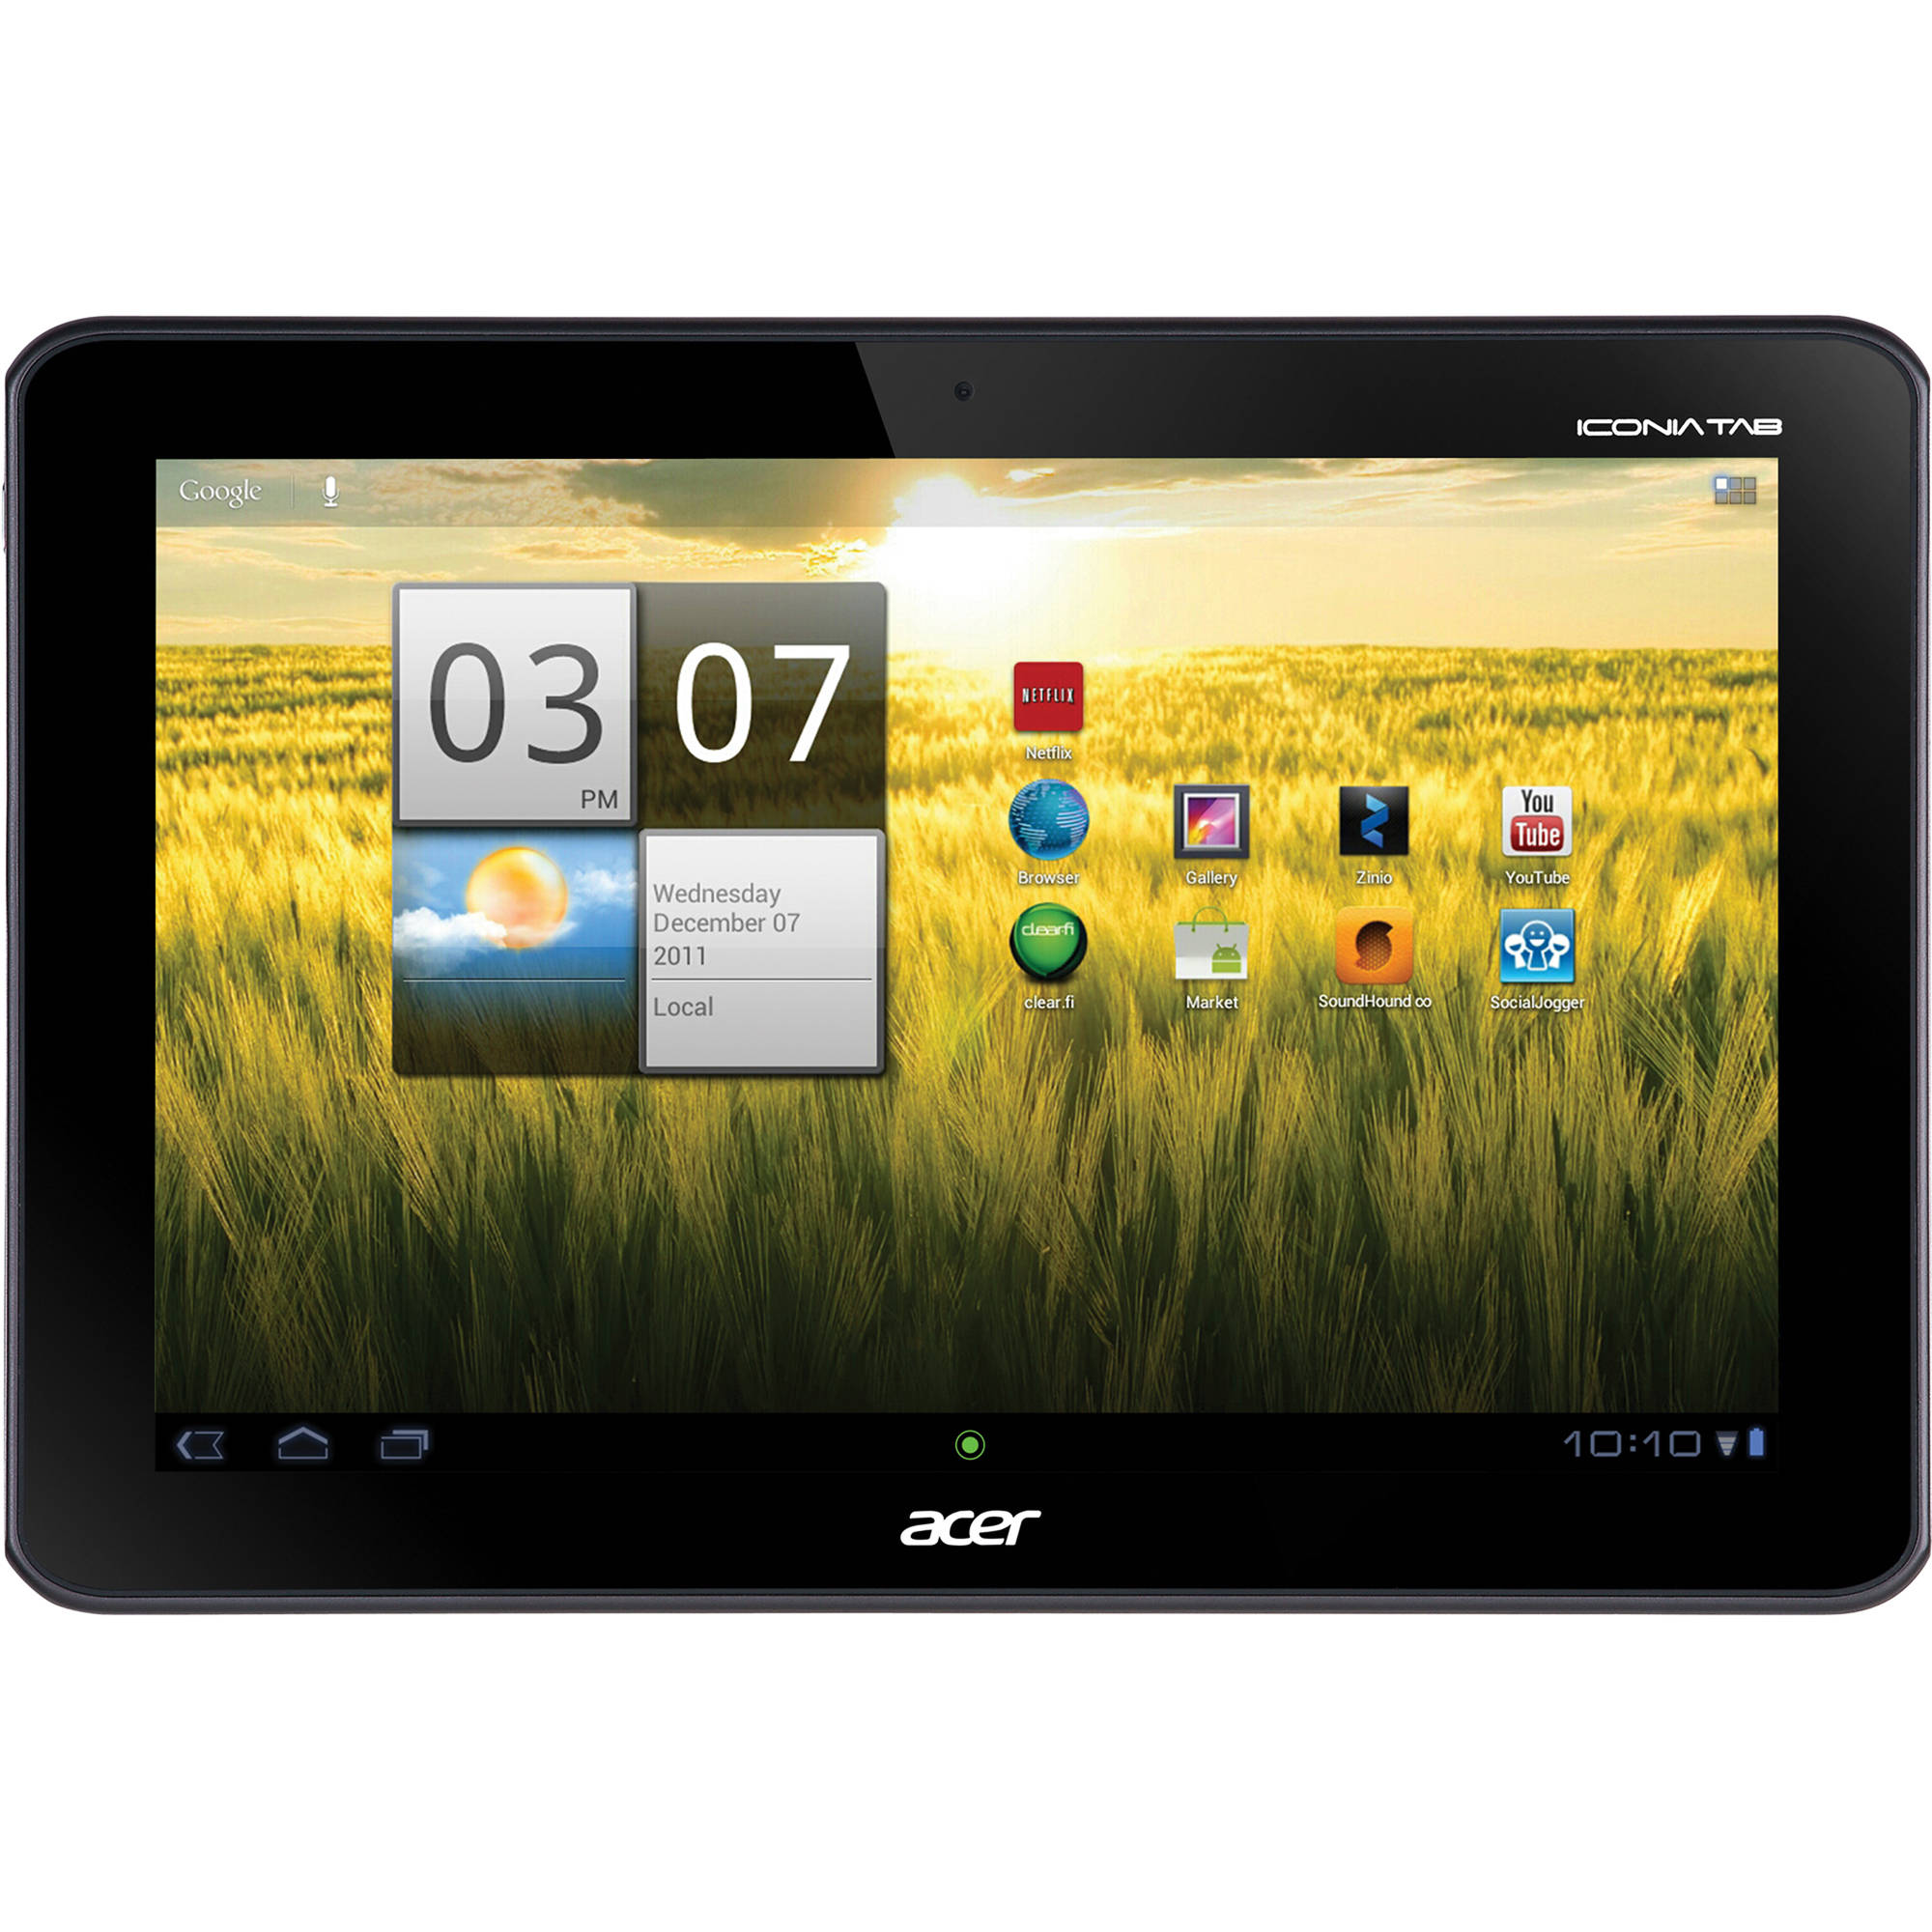 acer 16gb iconia tab a series 10 1 xe h8qpn 001 b h photo rh bhphotovideo com Acer Iconia 2017 Acer Iconia Tab 200